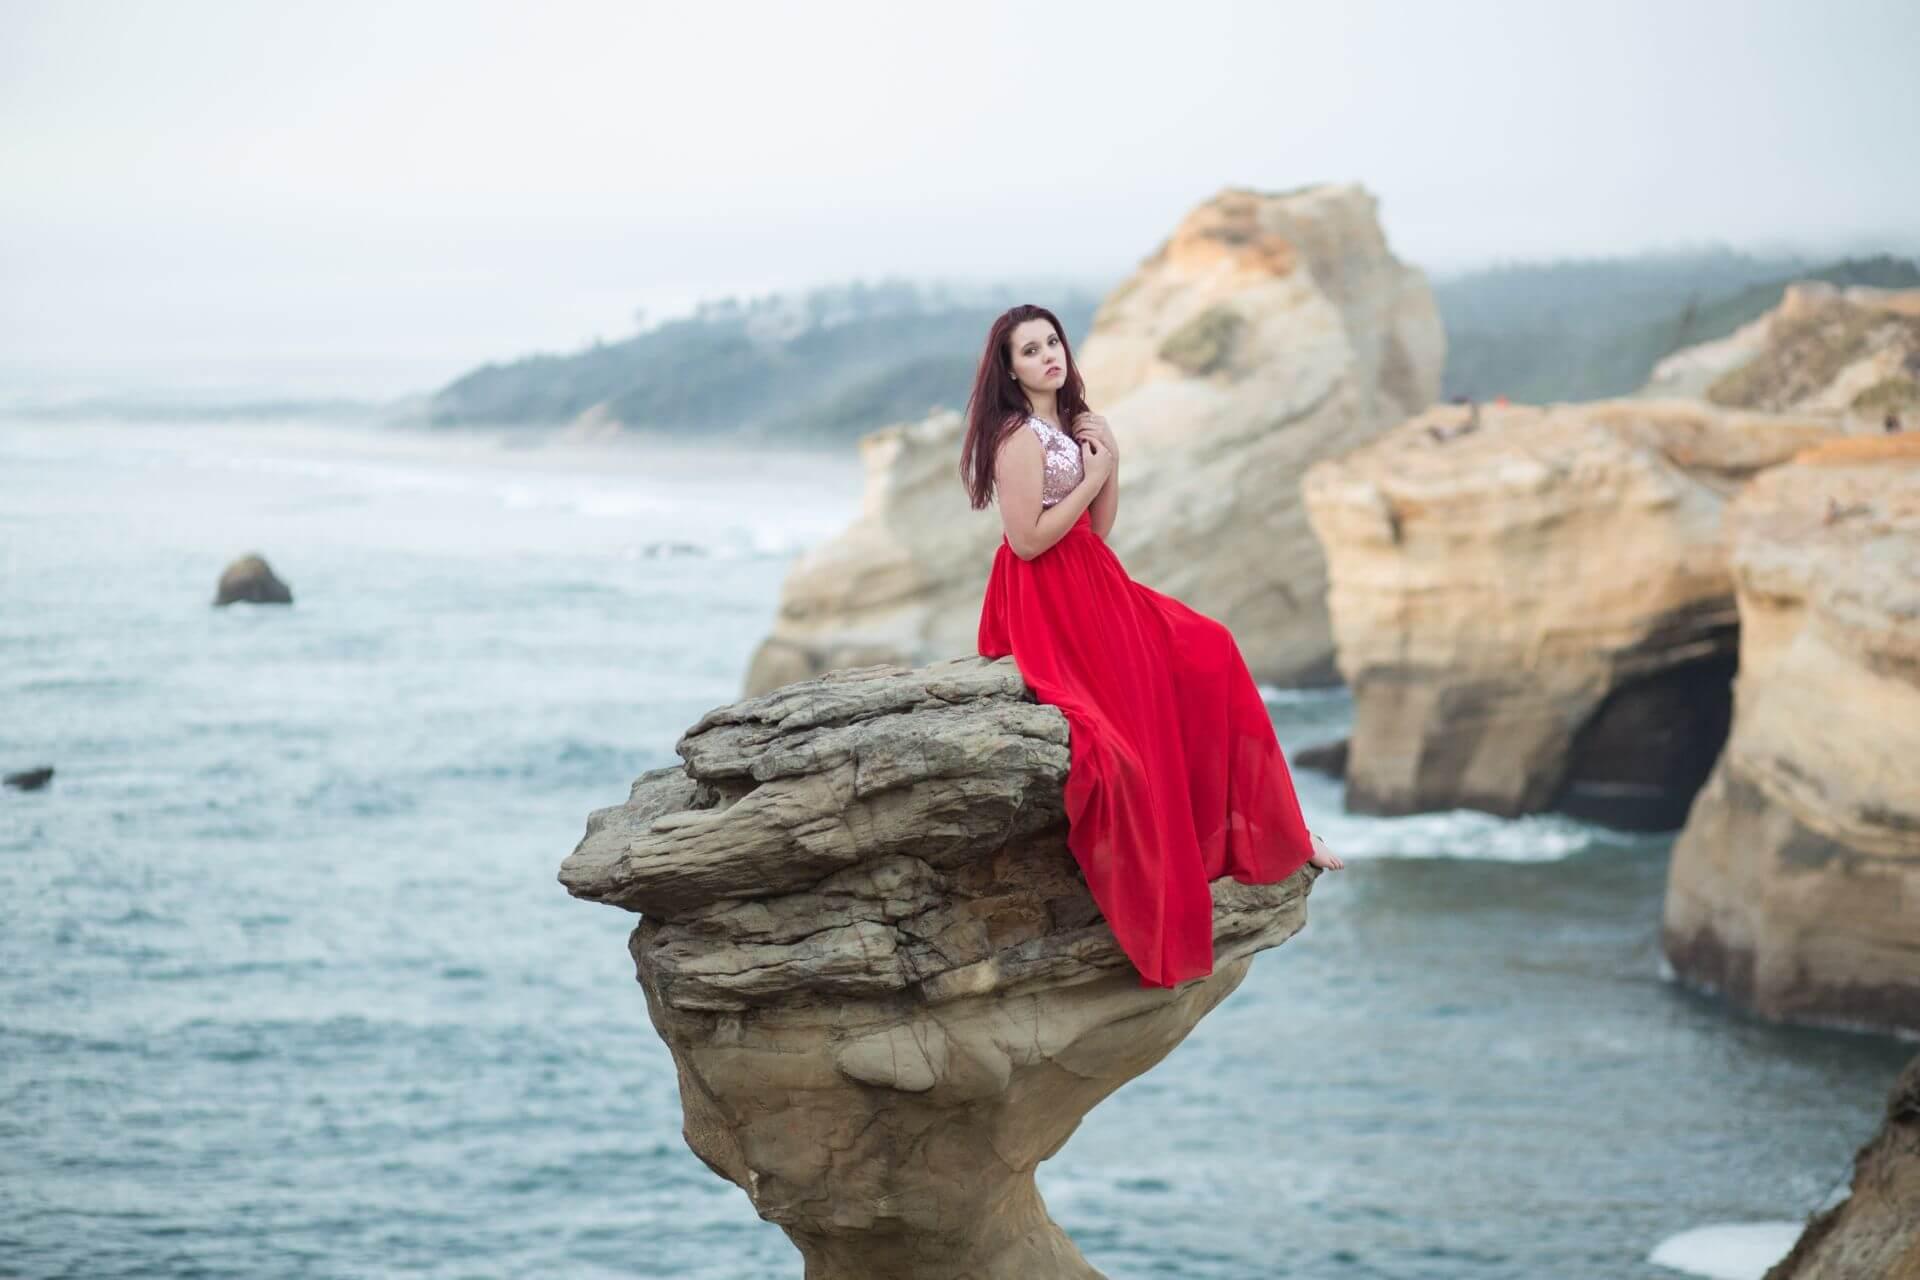 https://sleeklens.com/wp-content/uploads/2019/12/Ella-Before.jpg